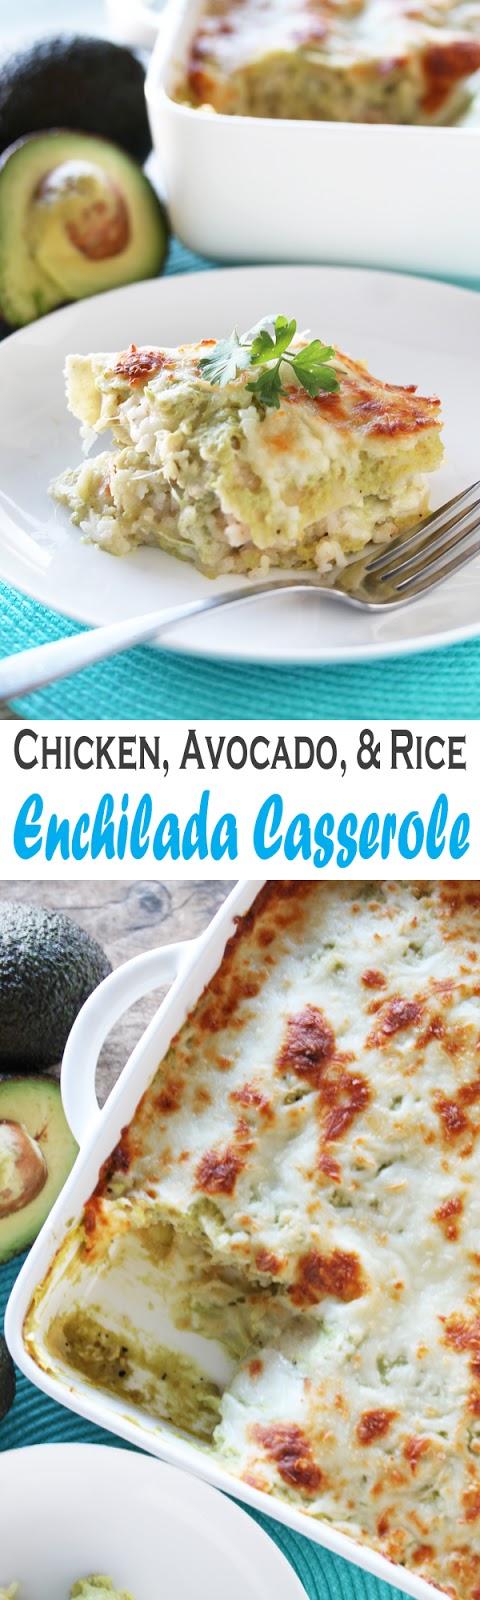 Chicken, Avocado, and Rice Enchilada Casserole